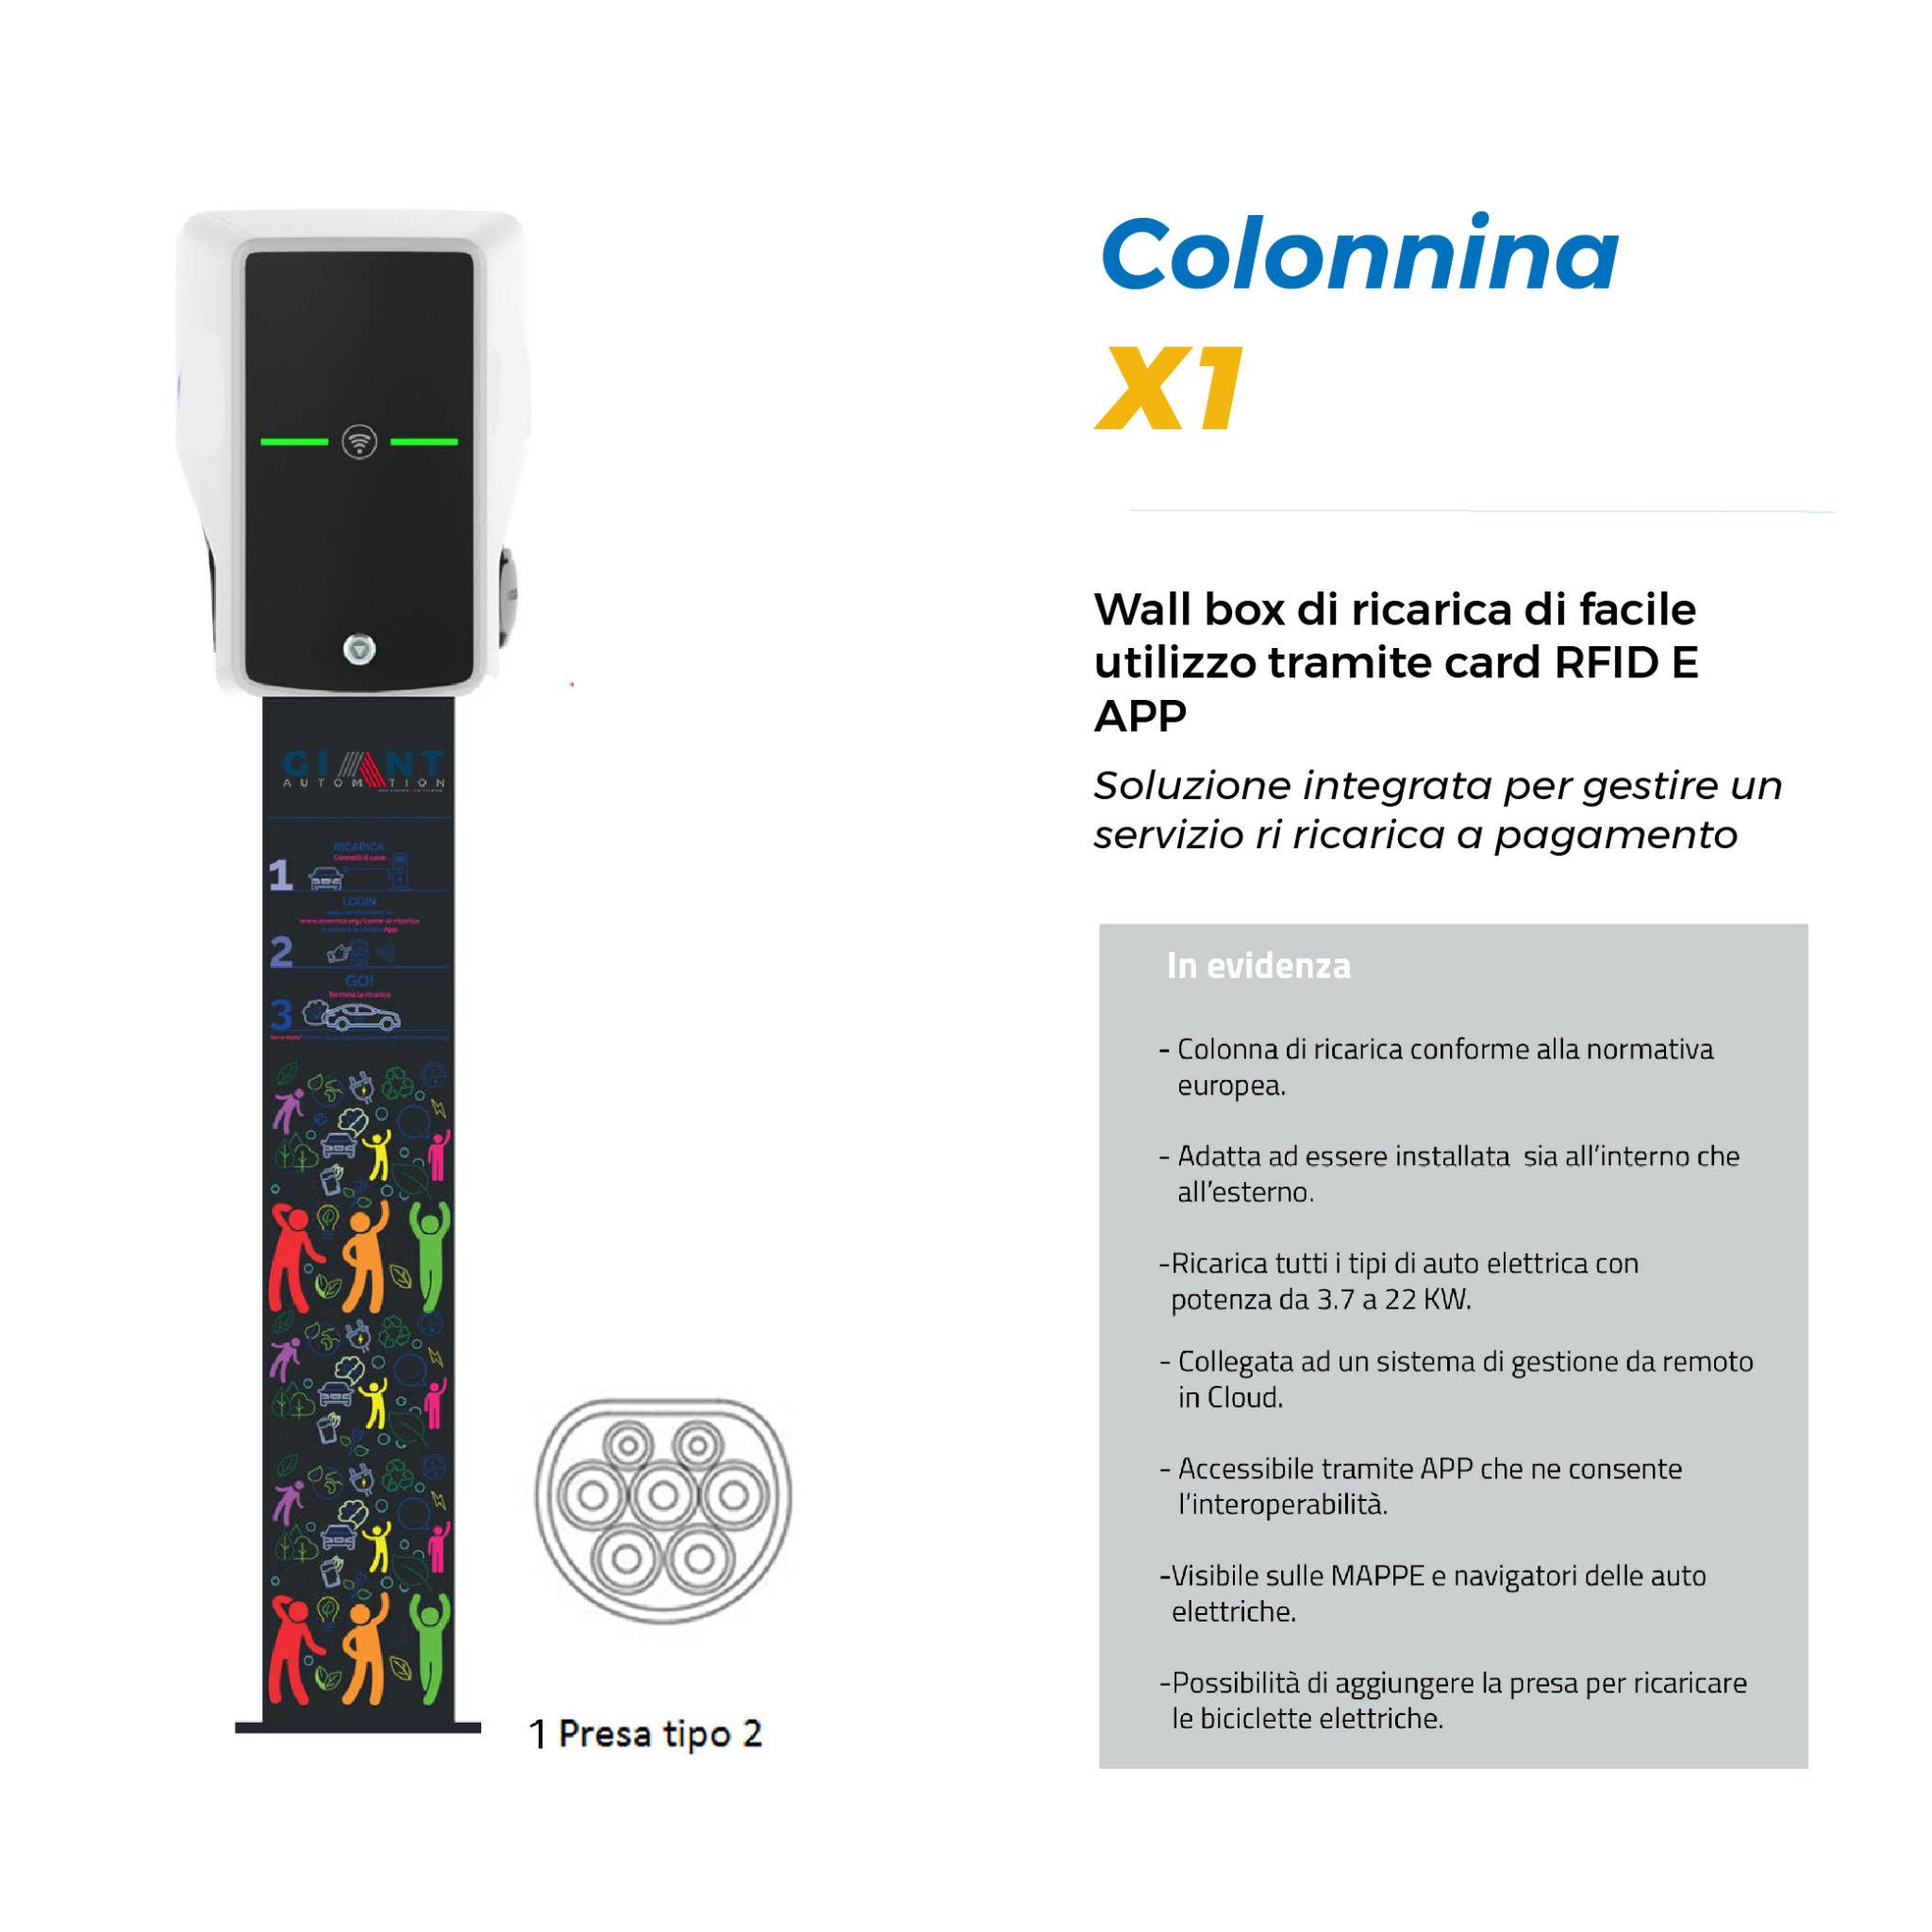 COLONNINE-x1-giantautomation